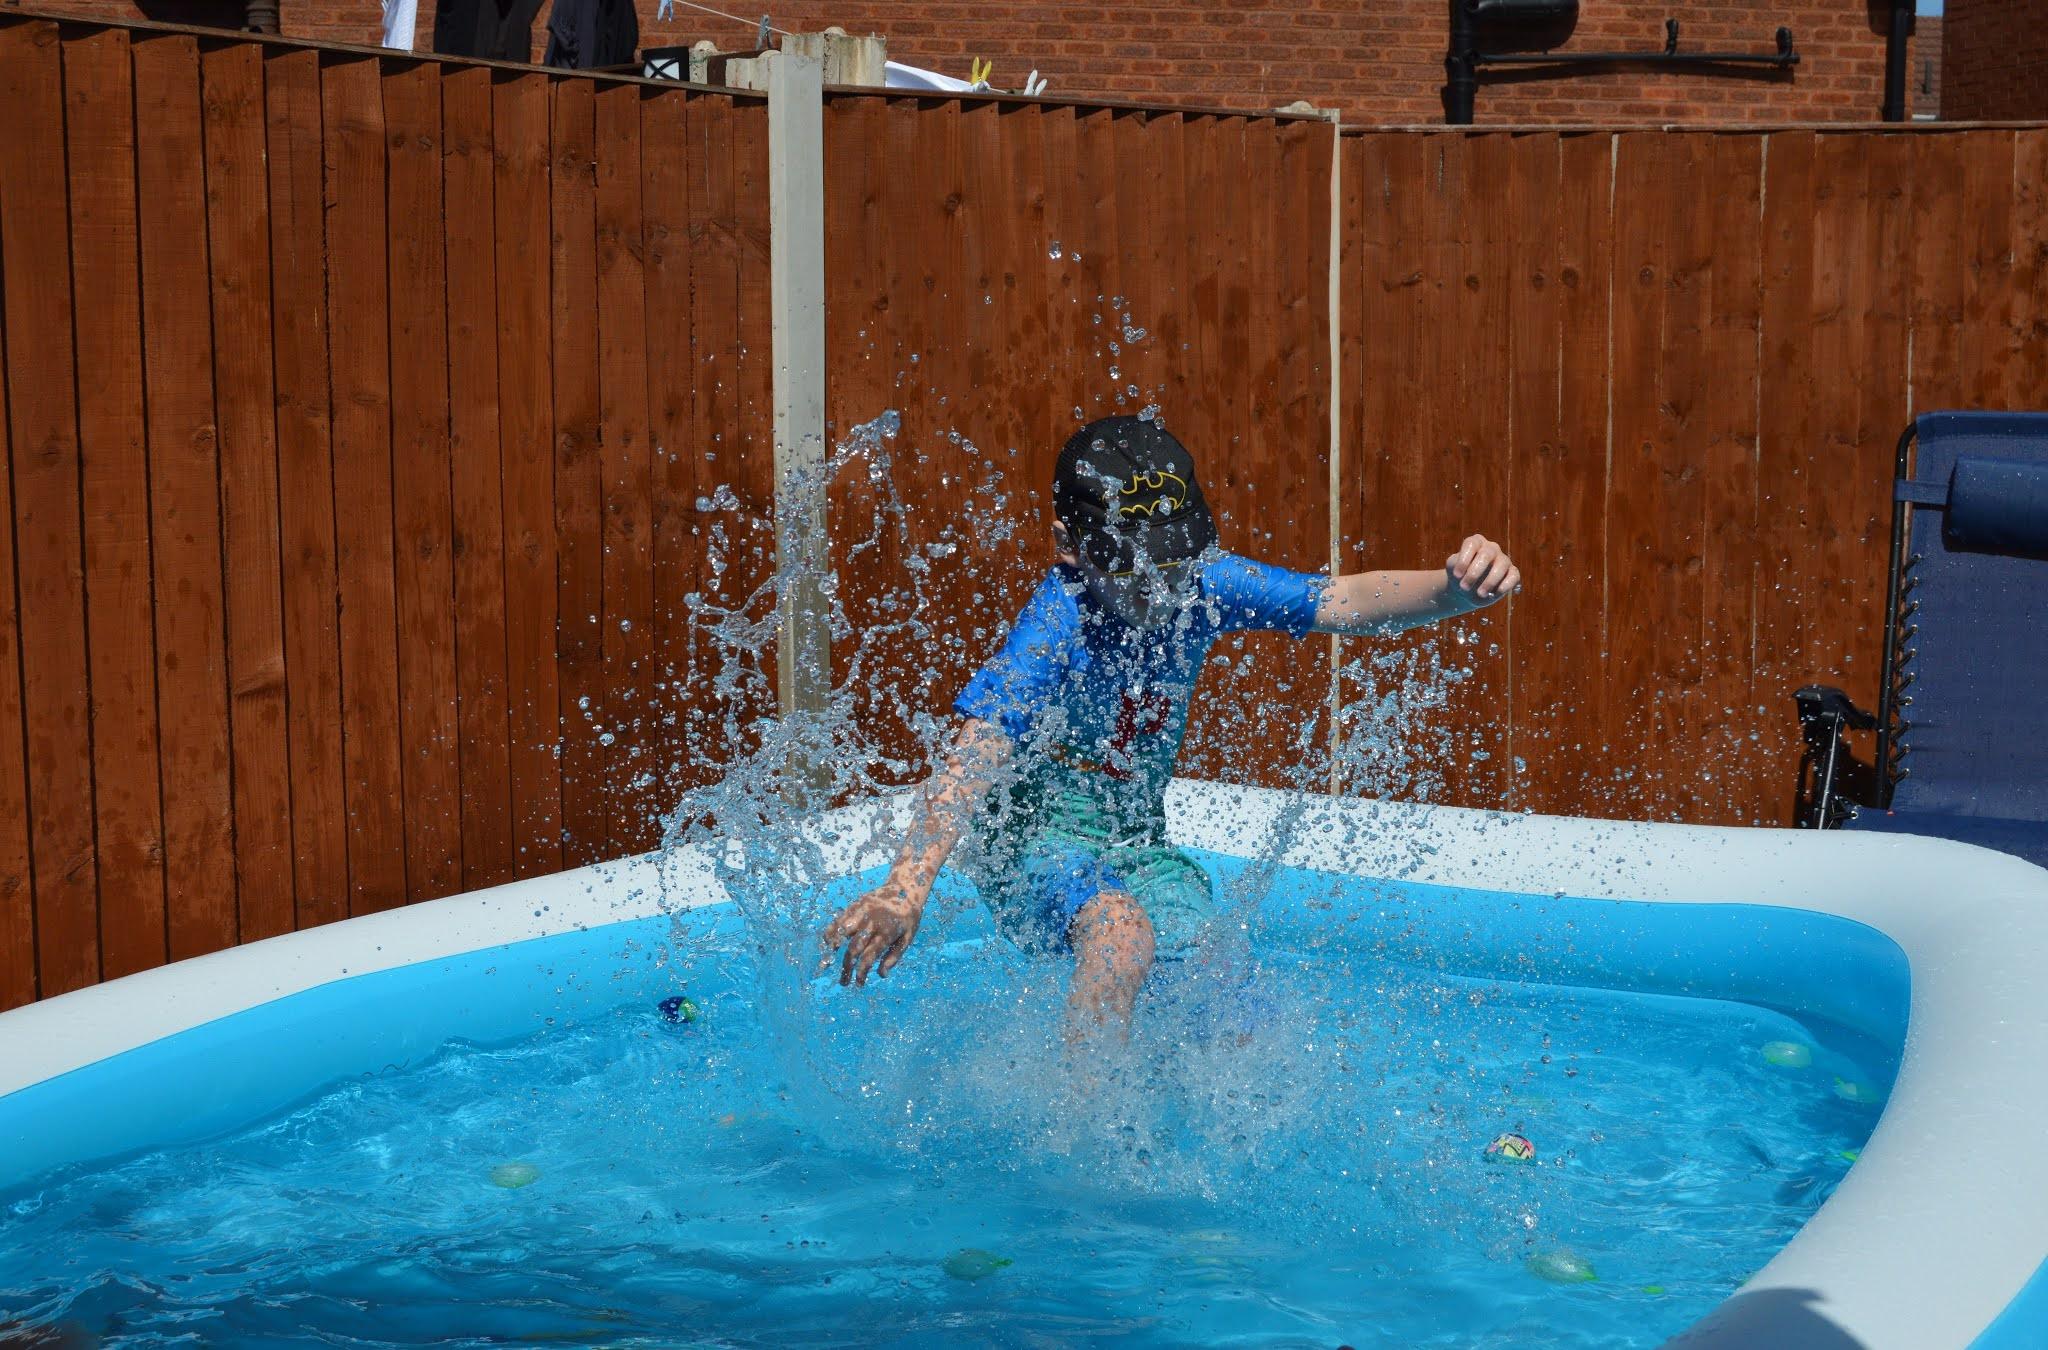 boy splashing in the pool